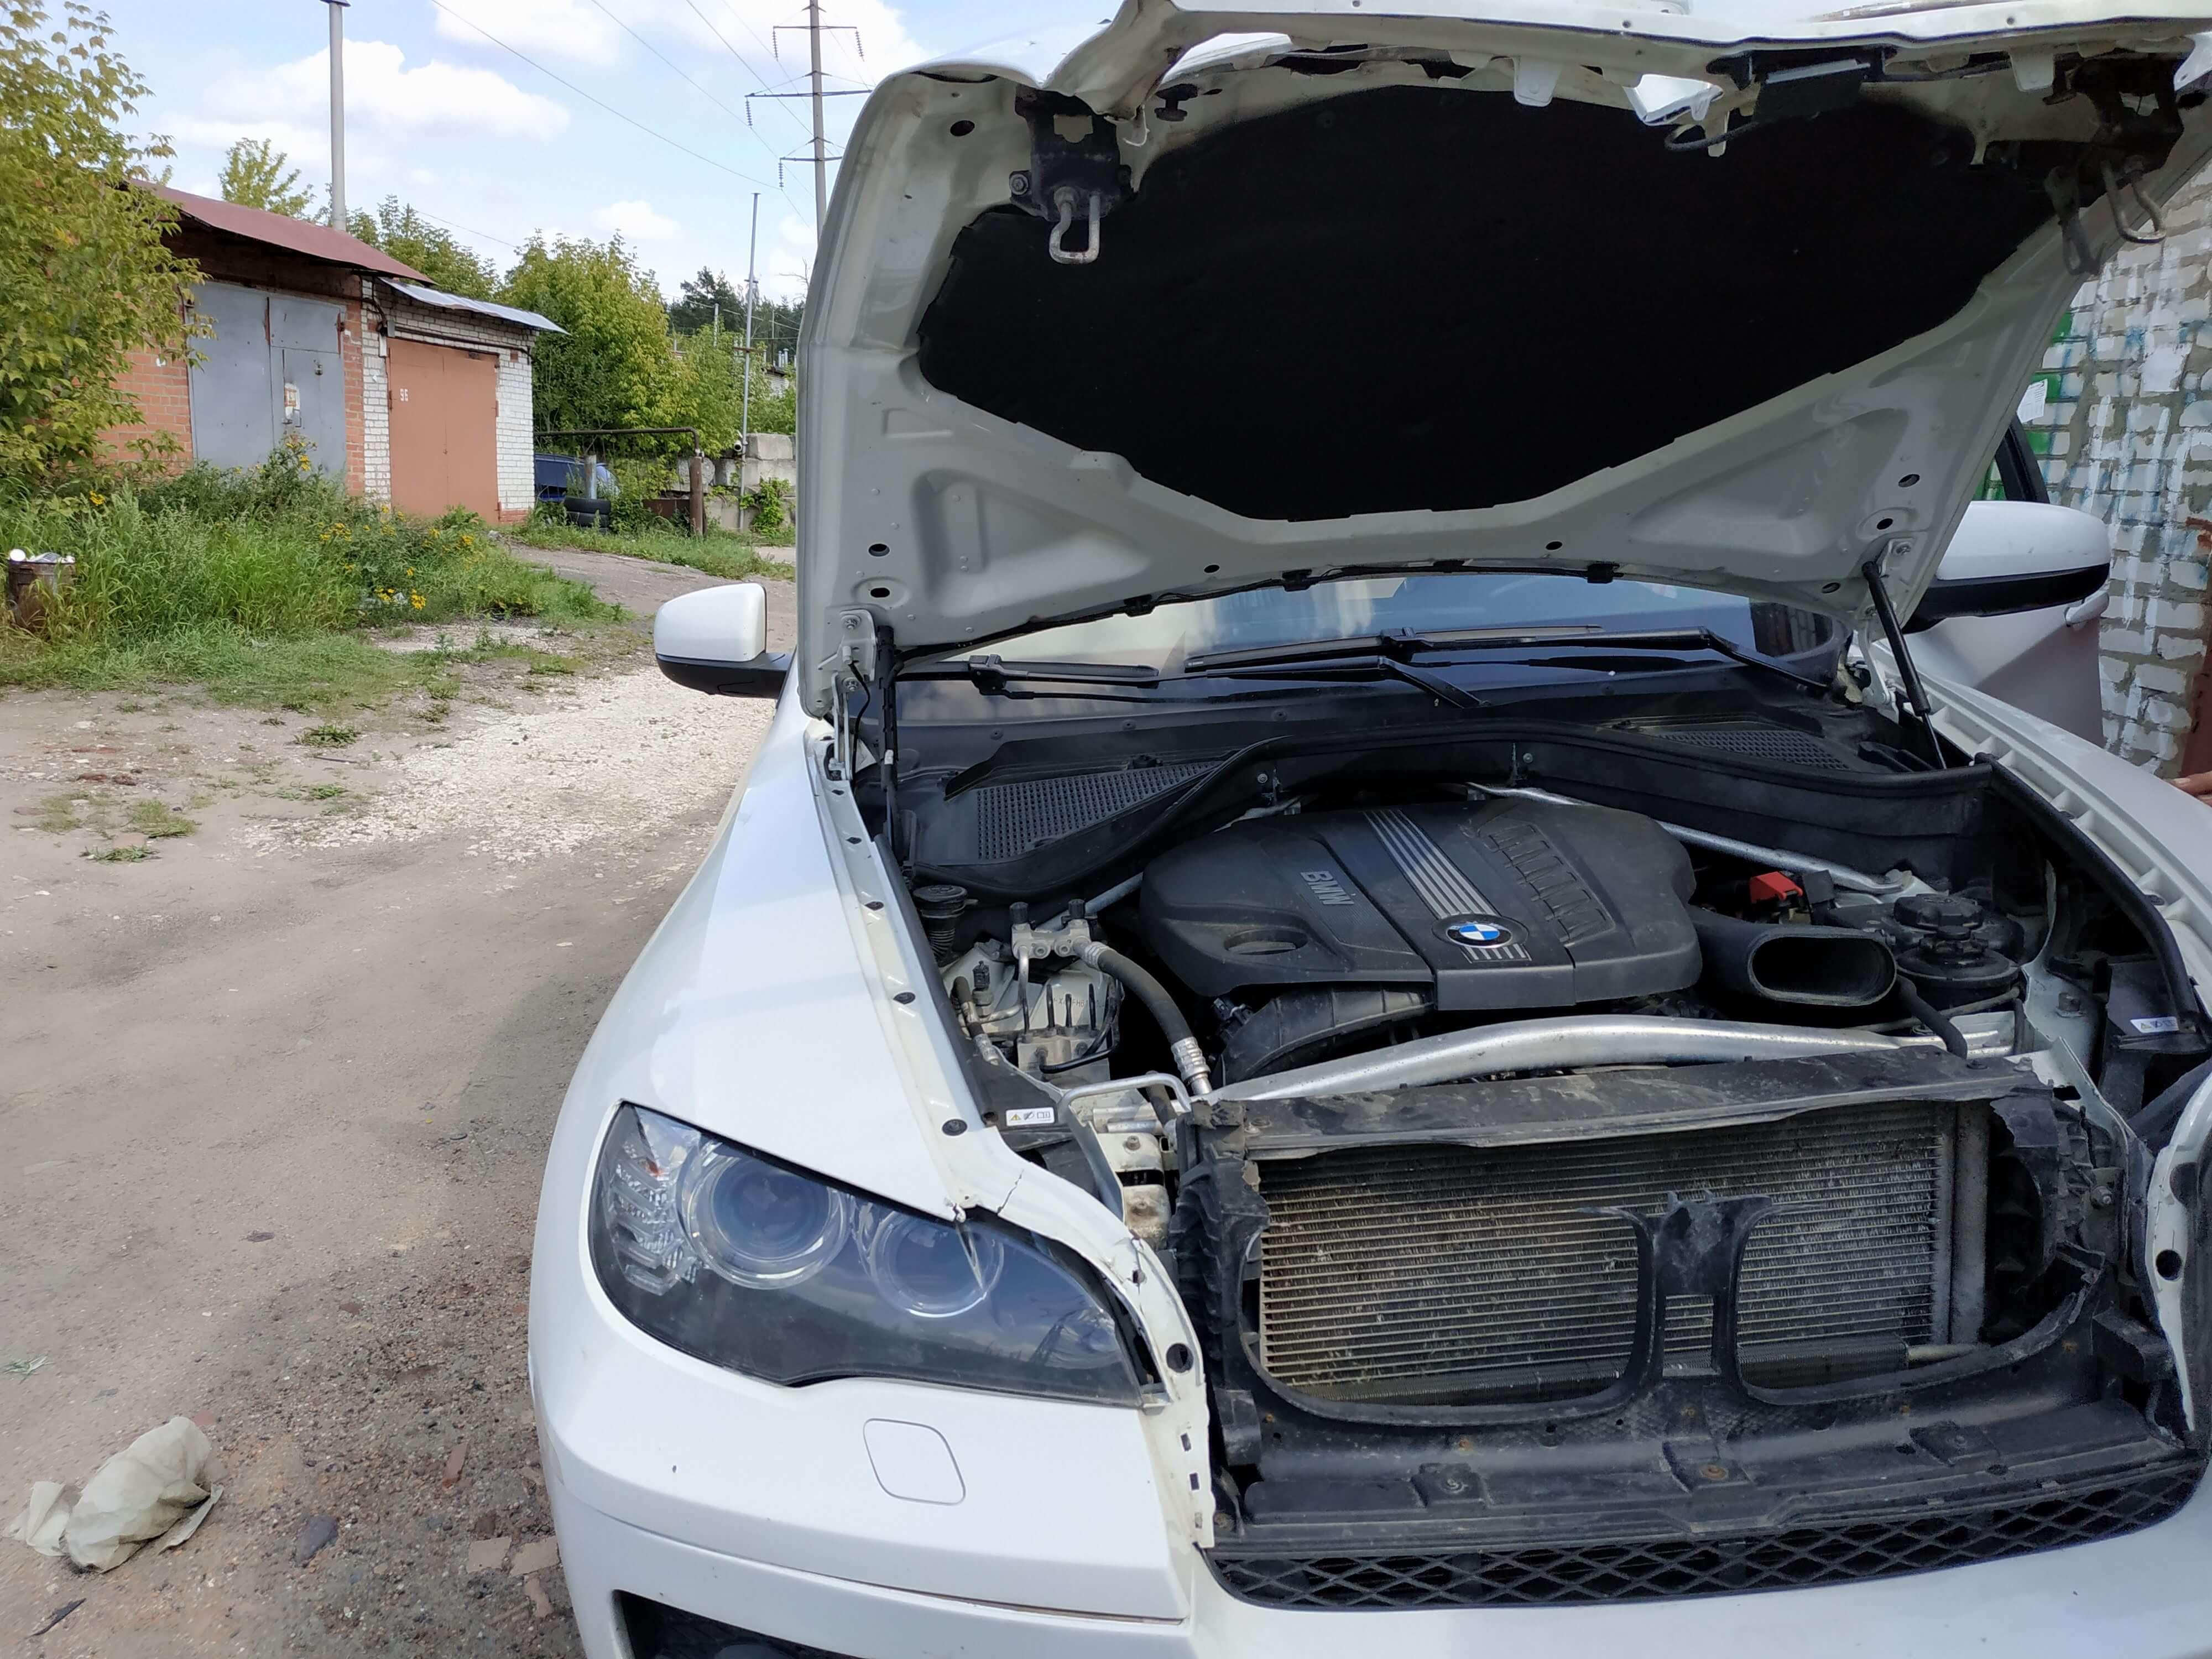 Чип тюнинг BMW X6 рестайлинг 3.0 дизель